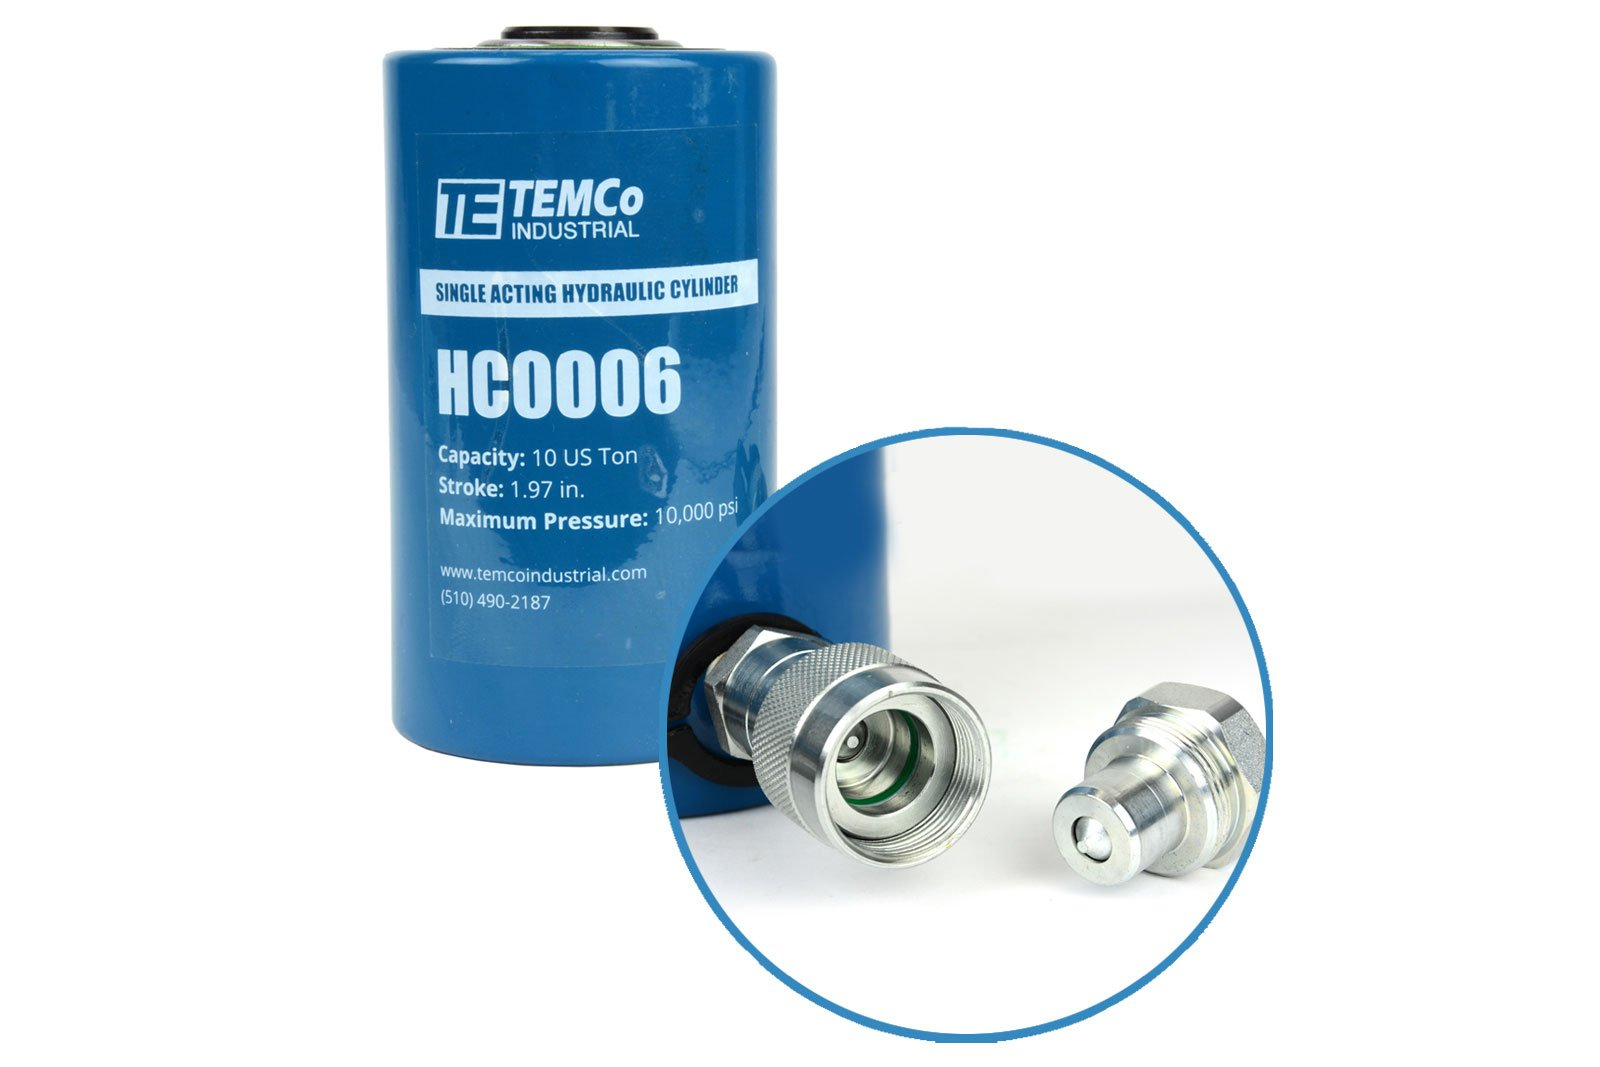 TEMCo HC0006 - Hydraulic Cylinder Ram Single Acting 10 TON 2'' Inch Stroke - 5 YEAR Warranty